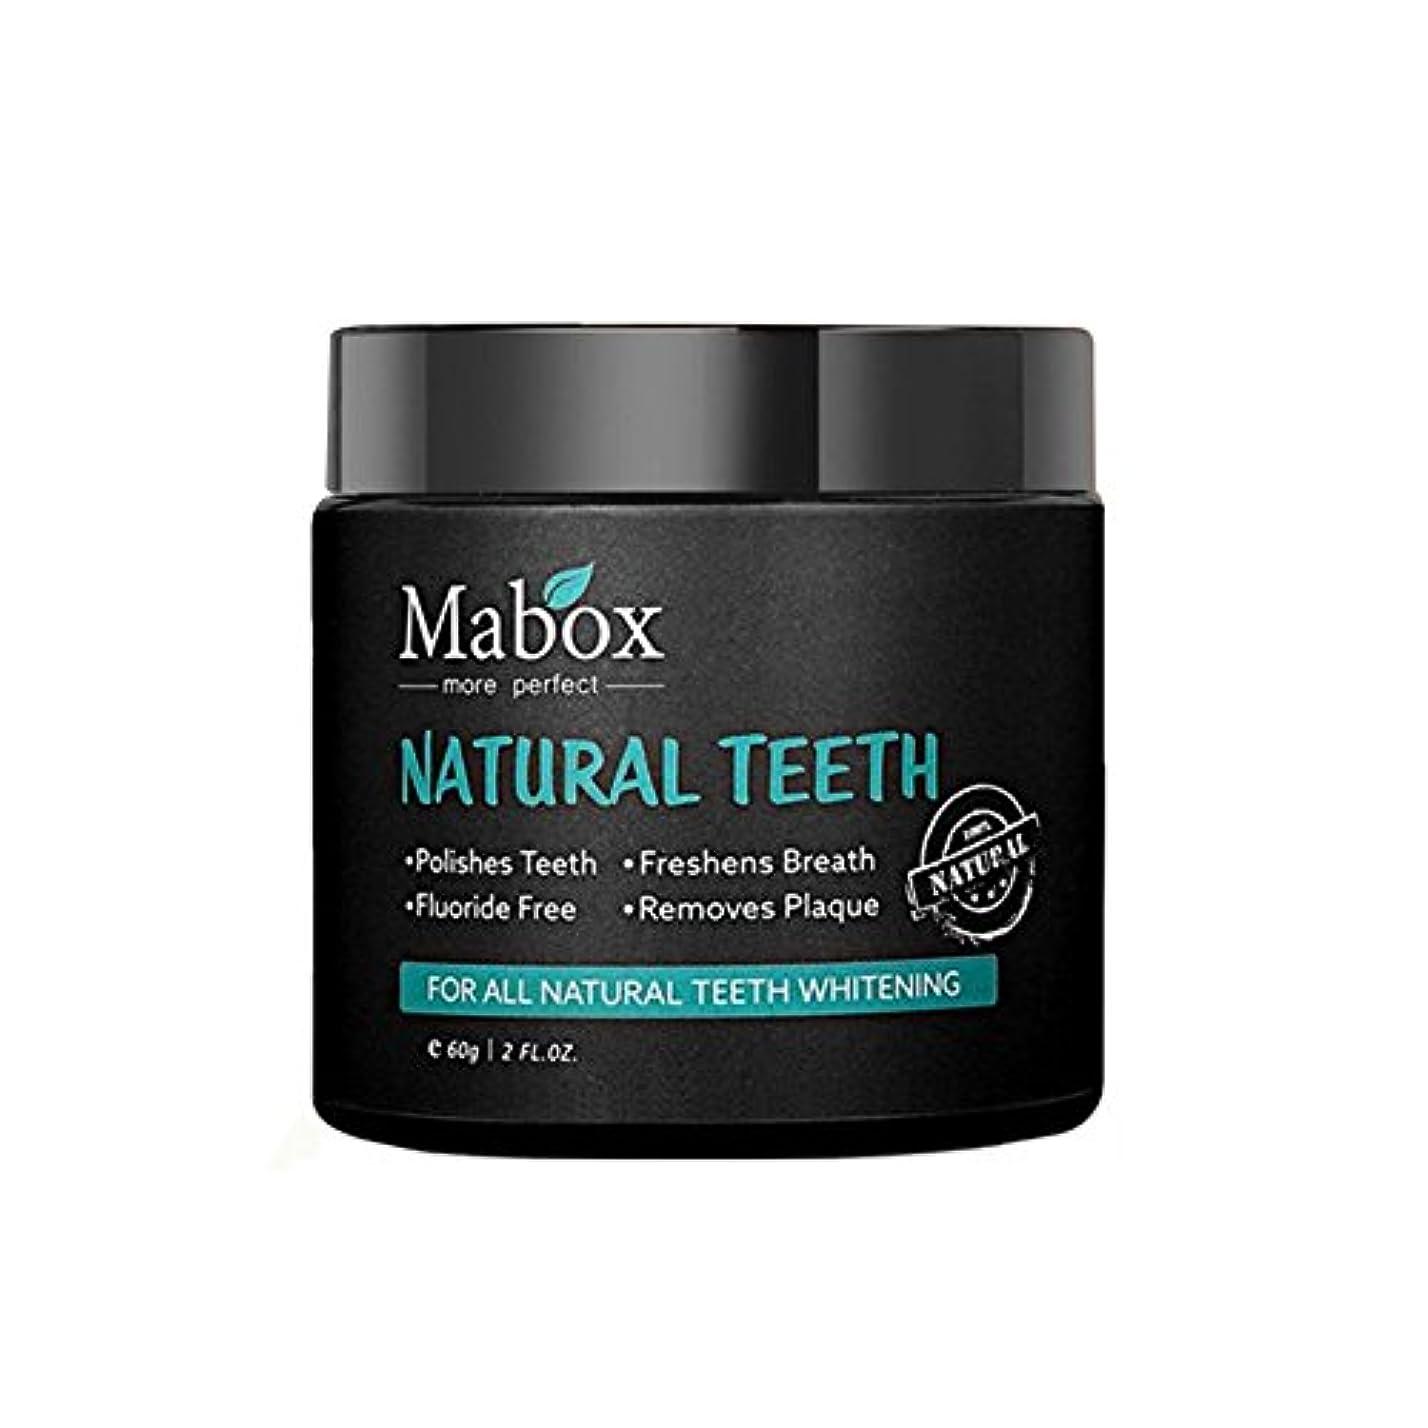 TerGOOSE 歯磨きパウダー 歯磨き粉 ホワイトニング 歯周病 活性炭 竹炭 美白 黄ばみ 口臭 虫歯予防 歯周病予防